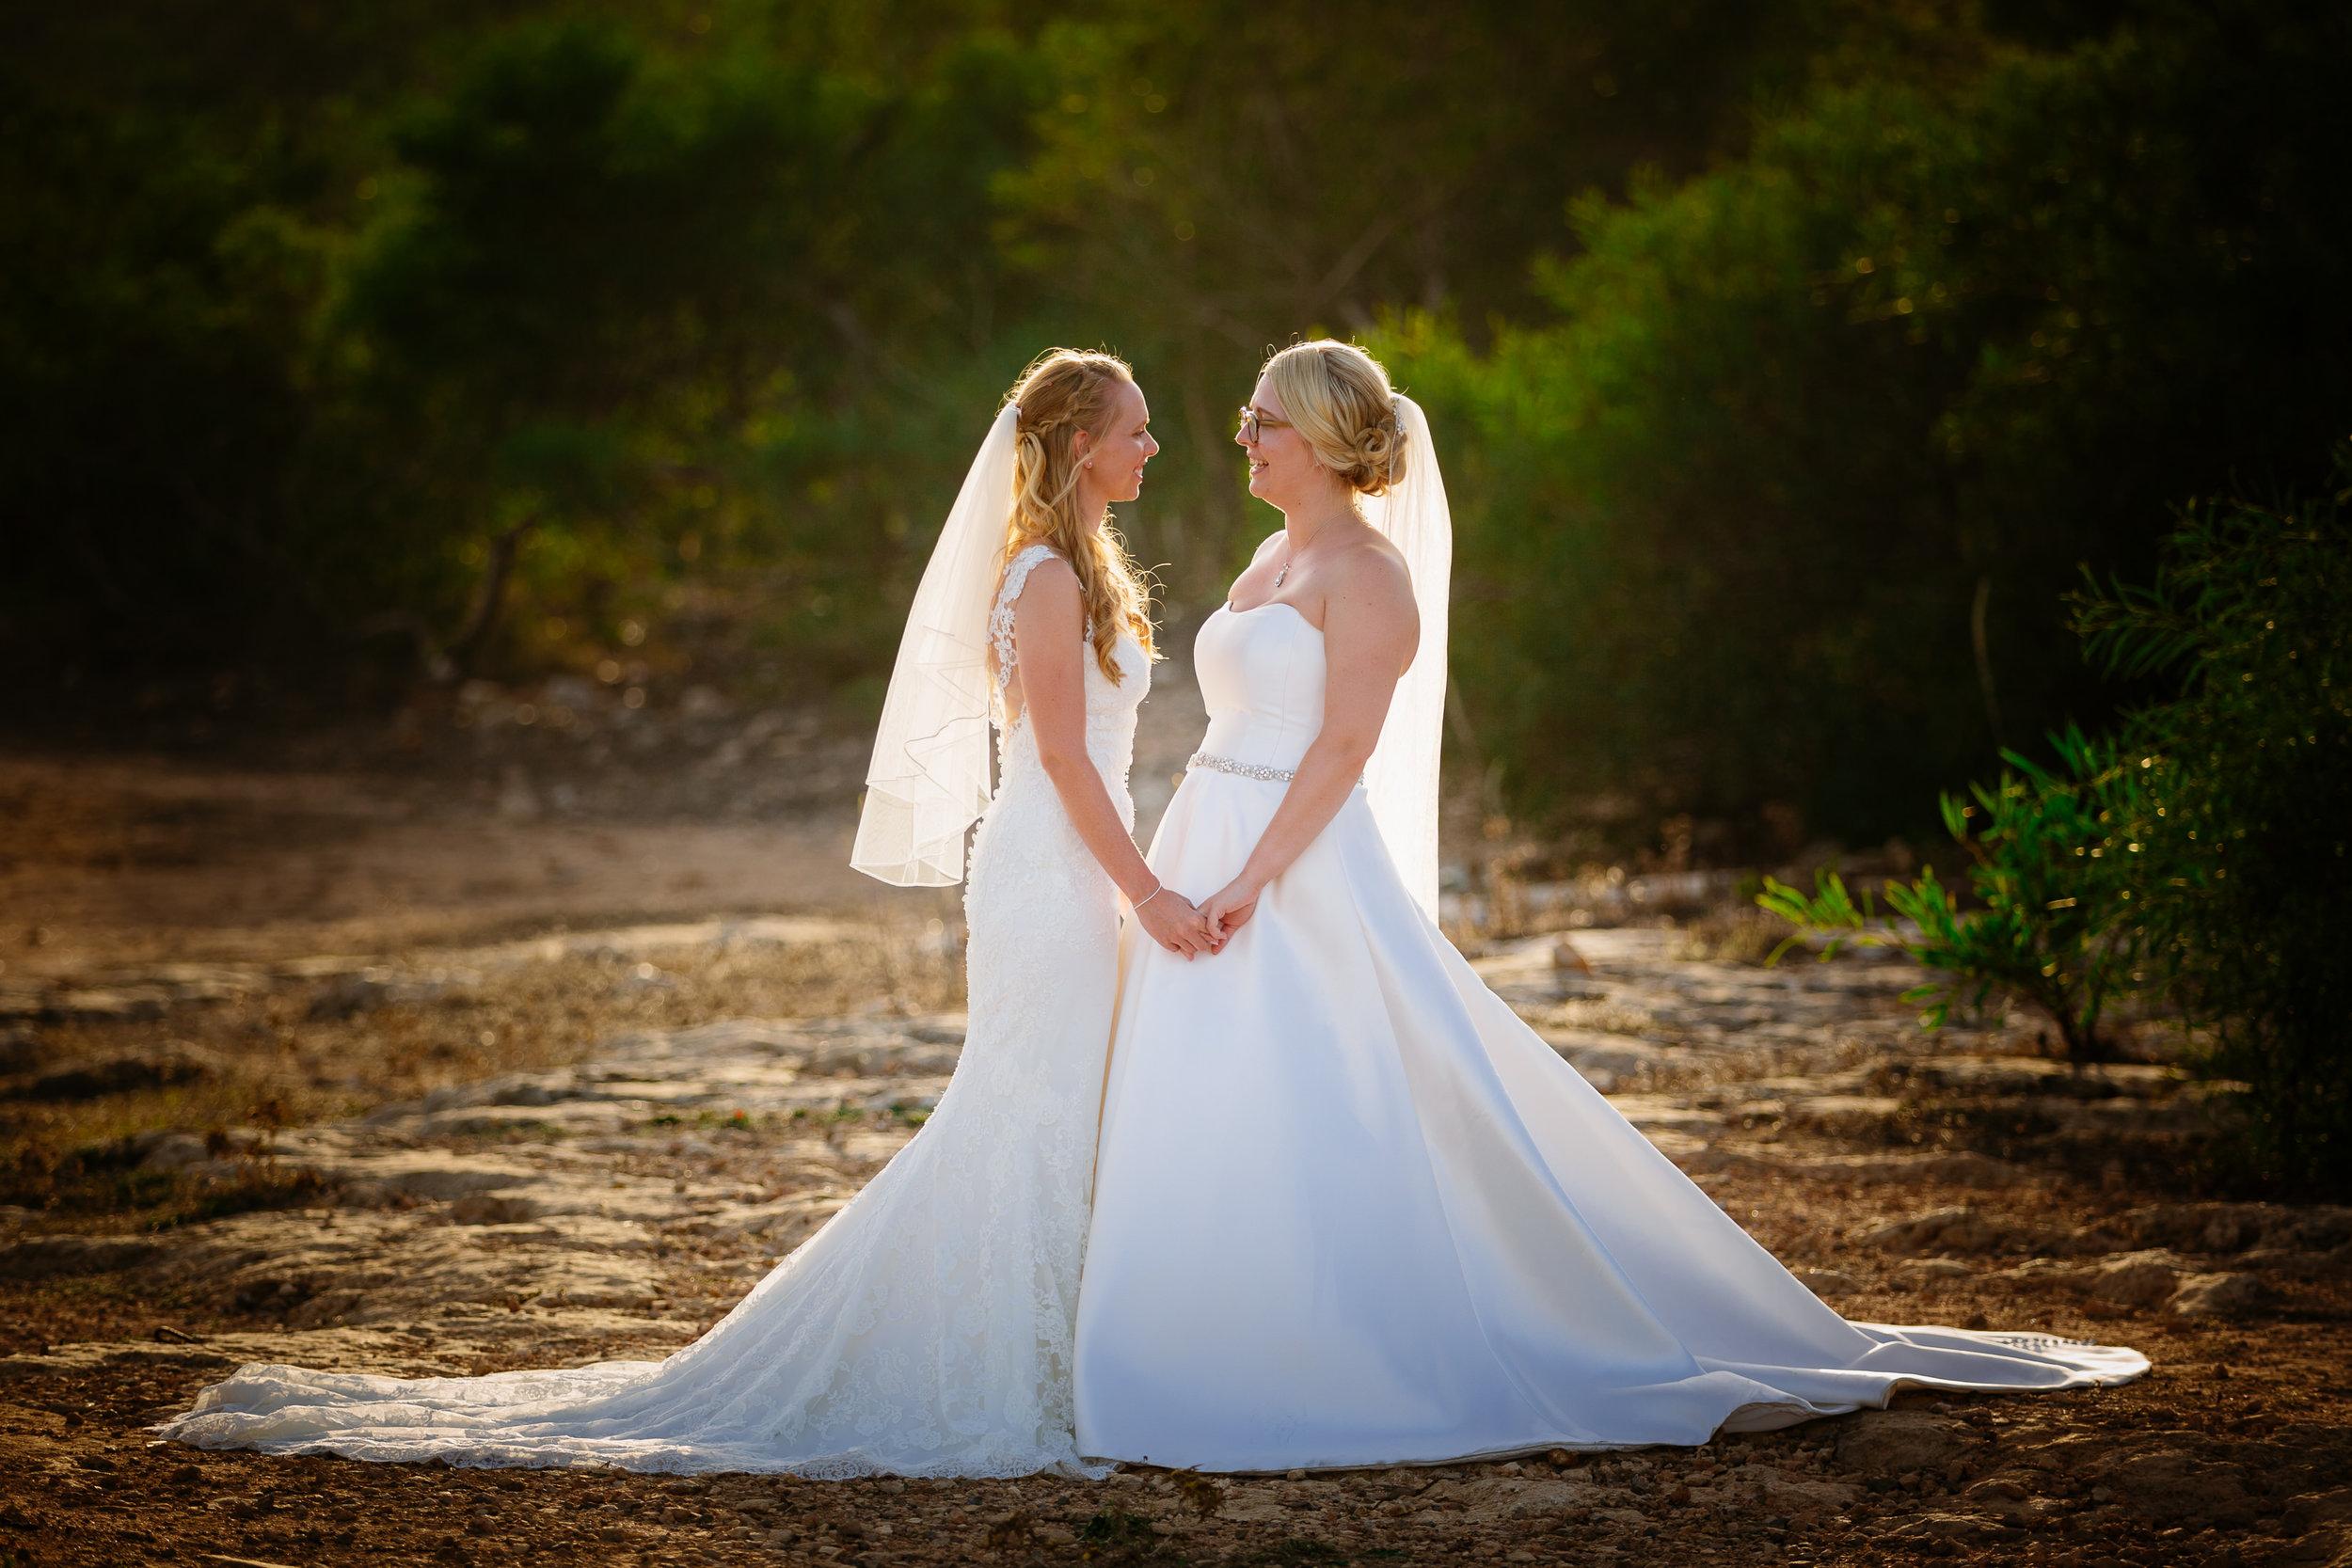 Malta_wedding_photography-83.jpg